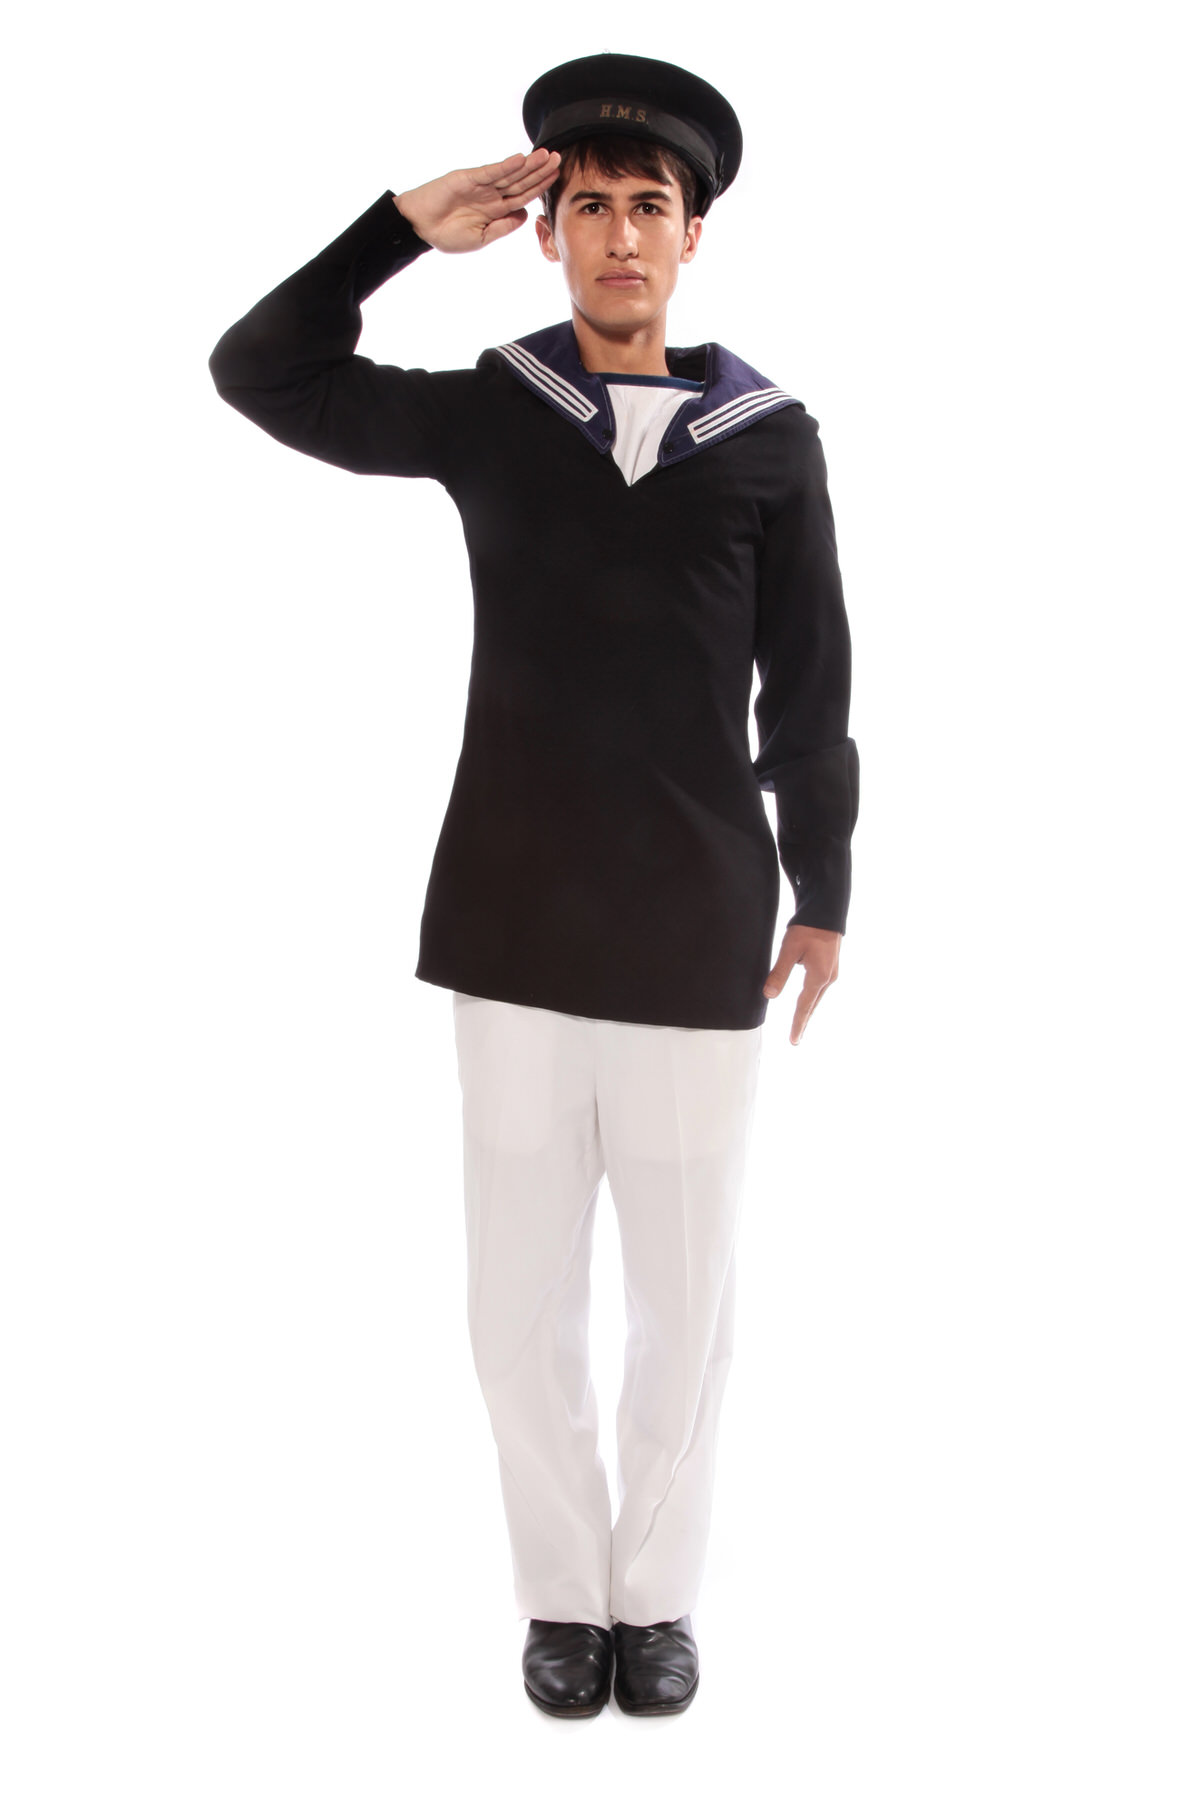 SAILOR NAVY COSTUME W OFFICERS PEAKED CAP